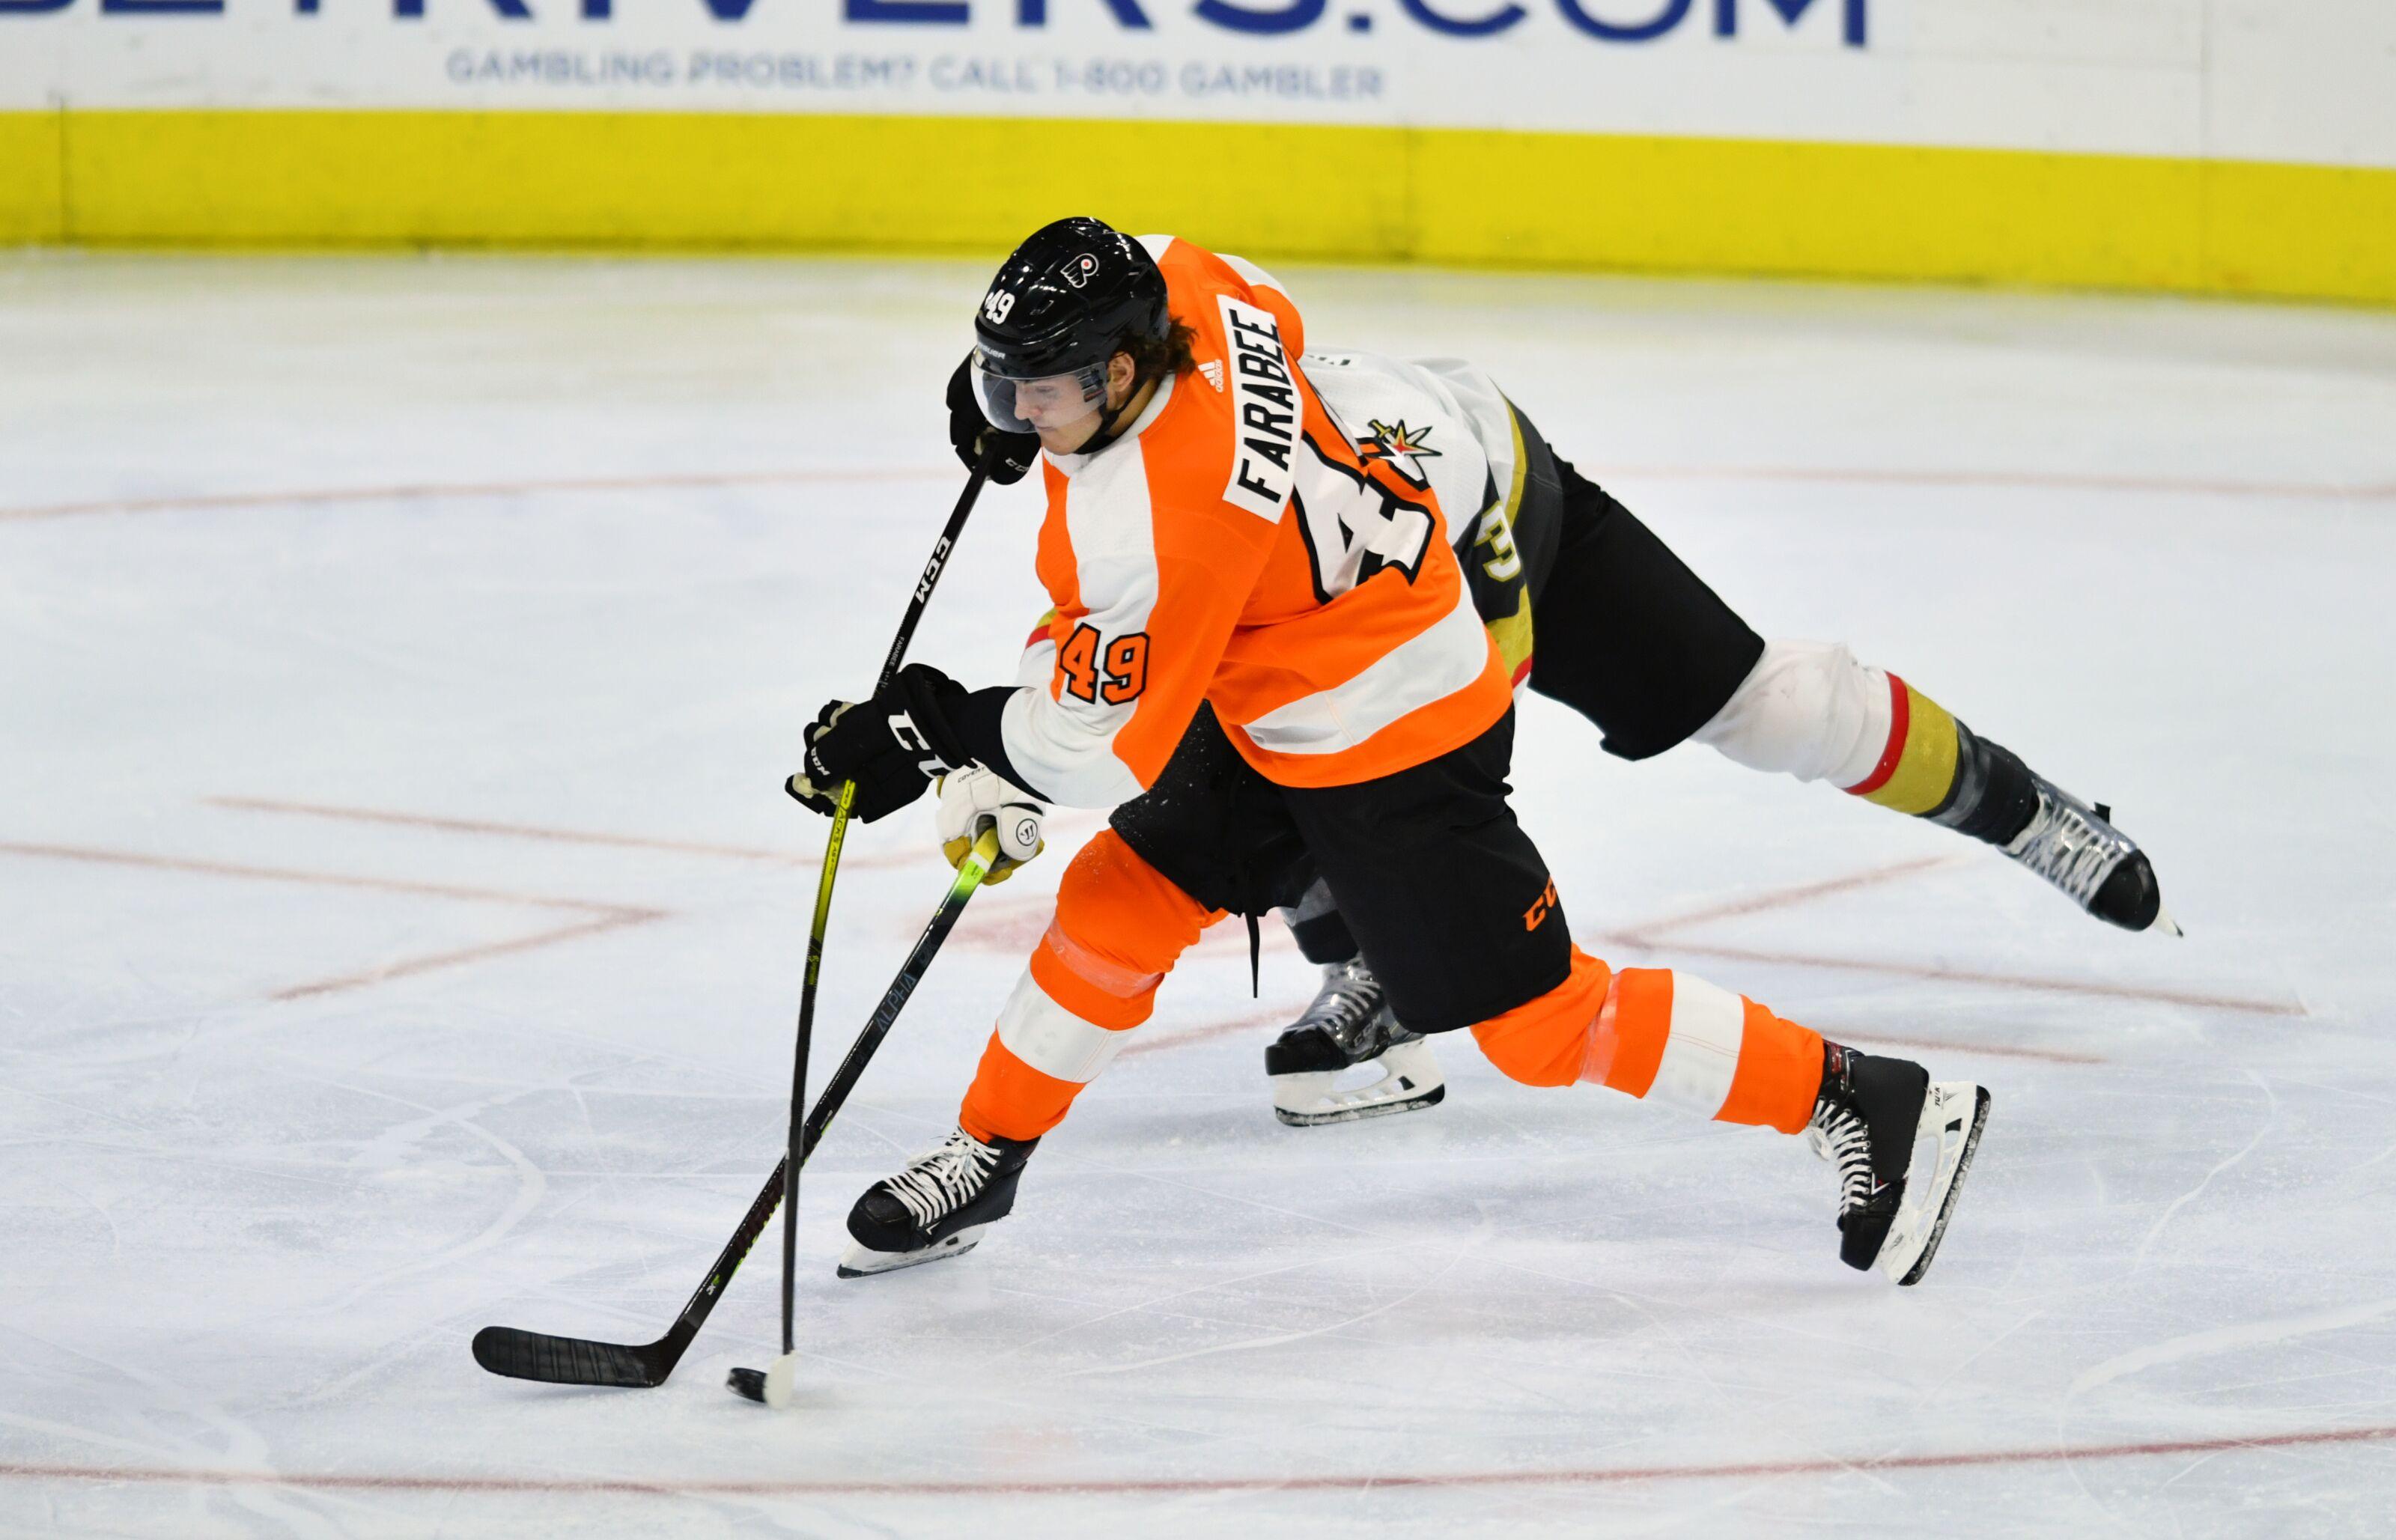 Philadelphia Flyers: How Did Joel Farabee Look In His First NHL Game?